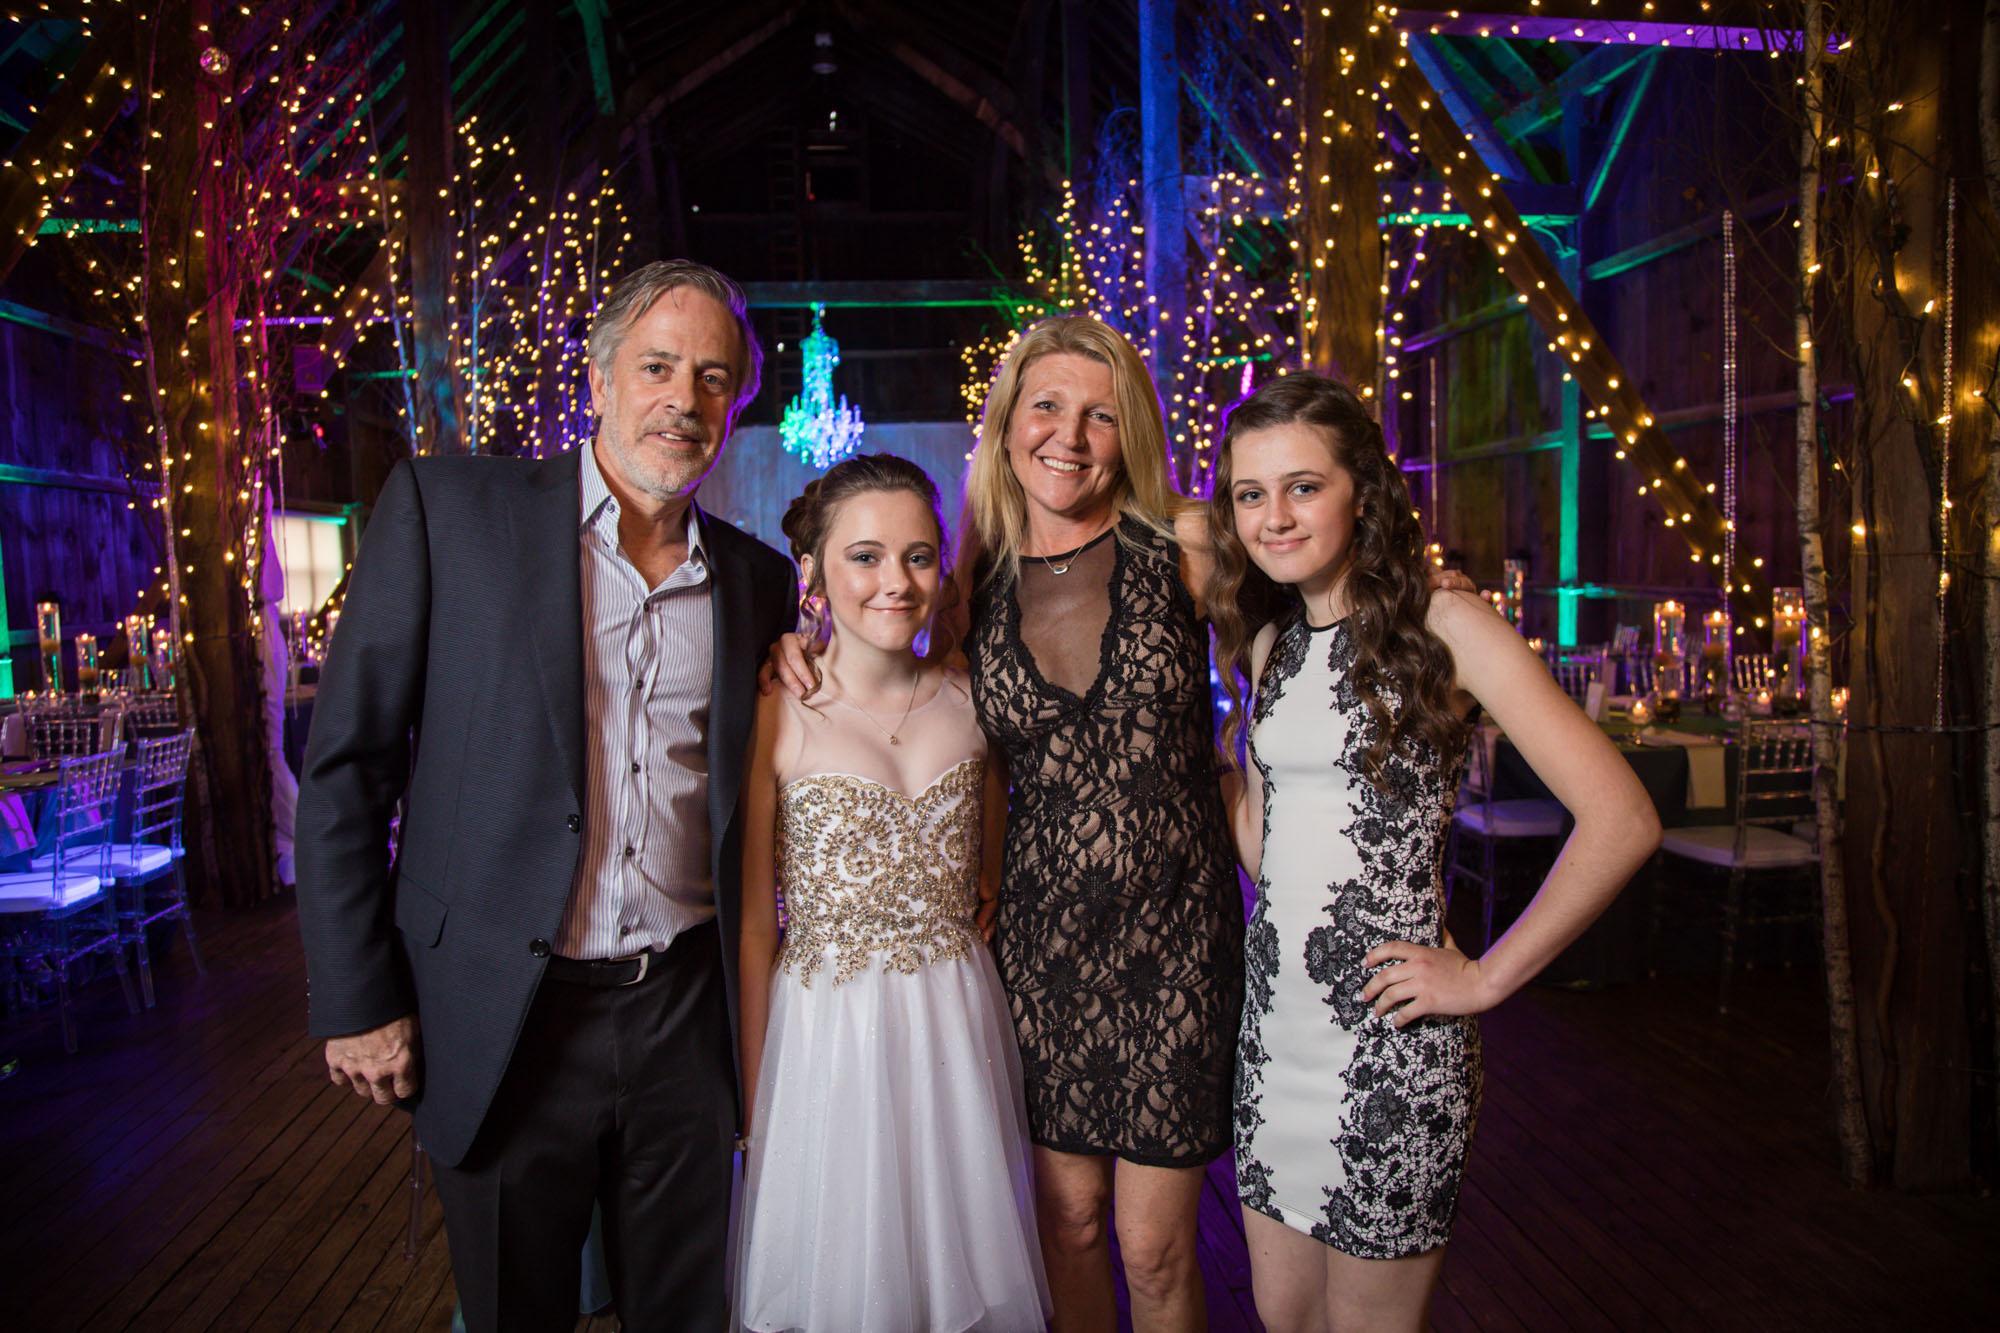 scranton_wedding_photographer_lettieri_pa (6 of 27).jpg